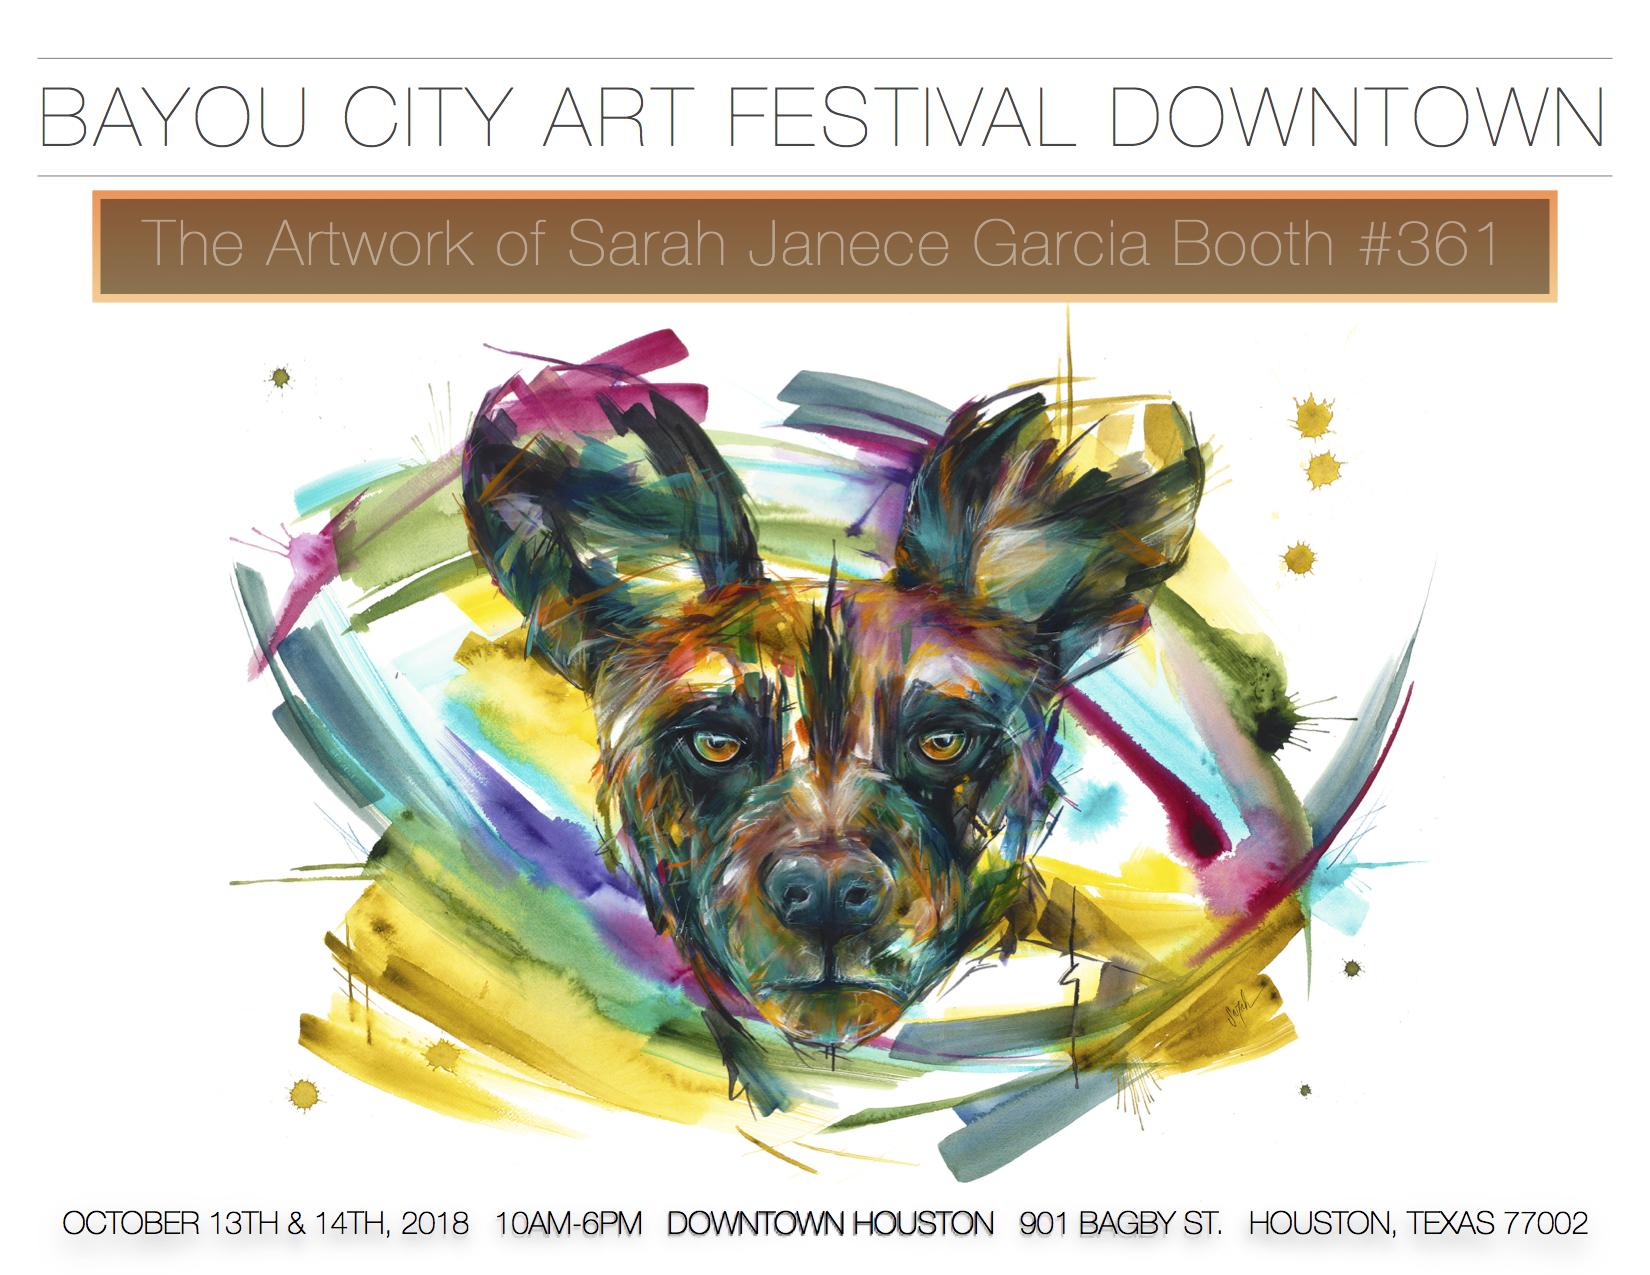 Bayou City Art Festival in Downtown Houston — Sarah Janece